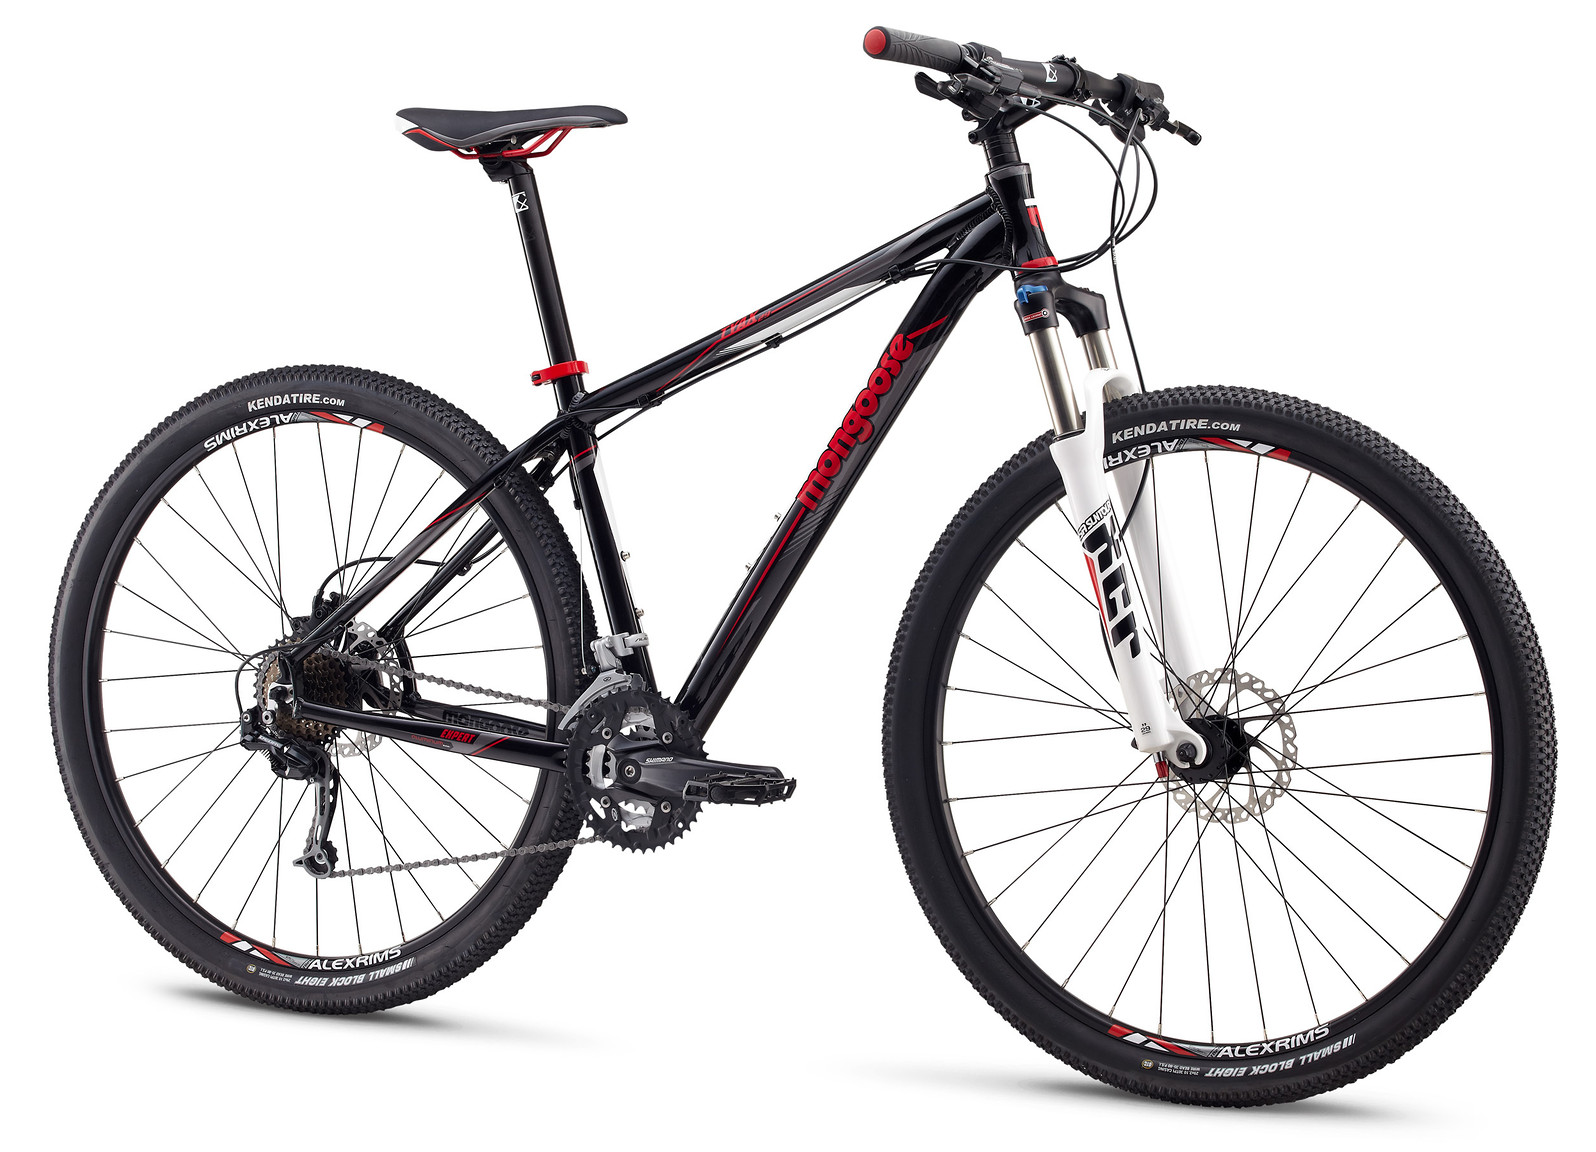 2014 Mongoose Tyax Expert 29 Bike